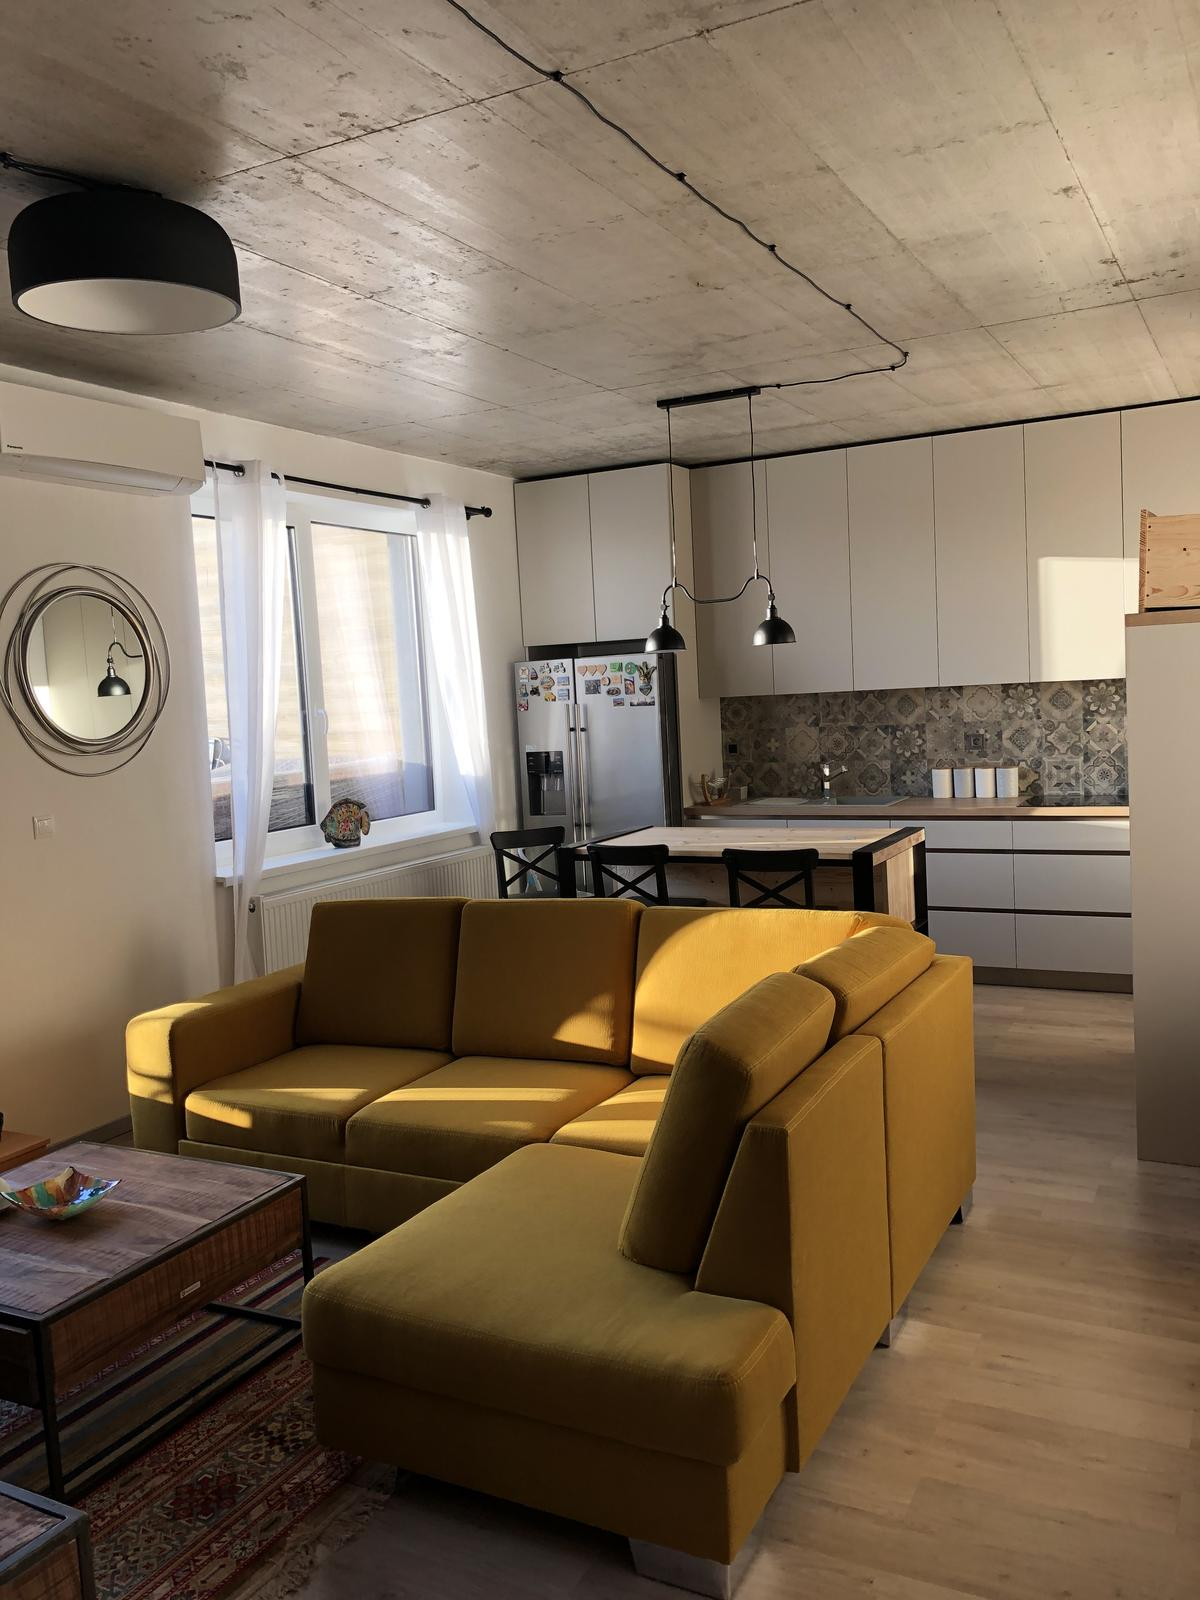 Náš bytík na streche - obývačka s kuchyňou